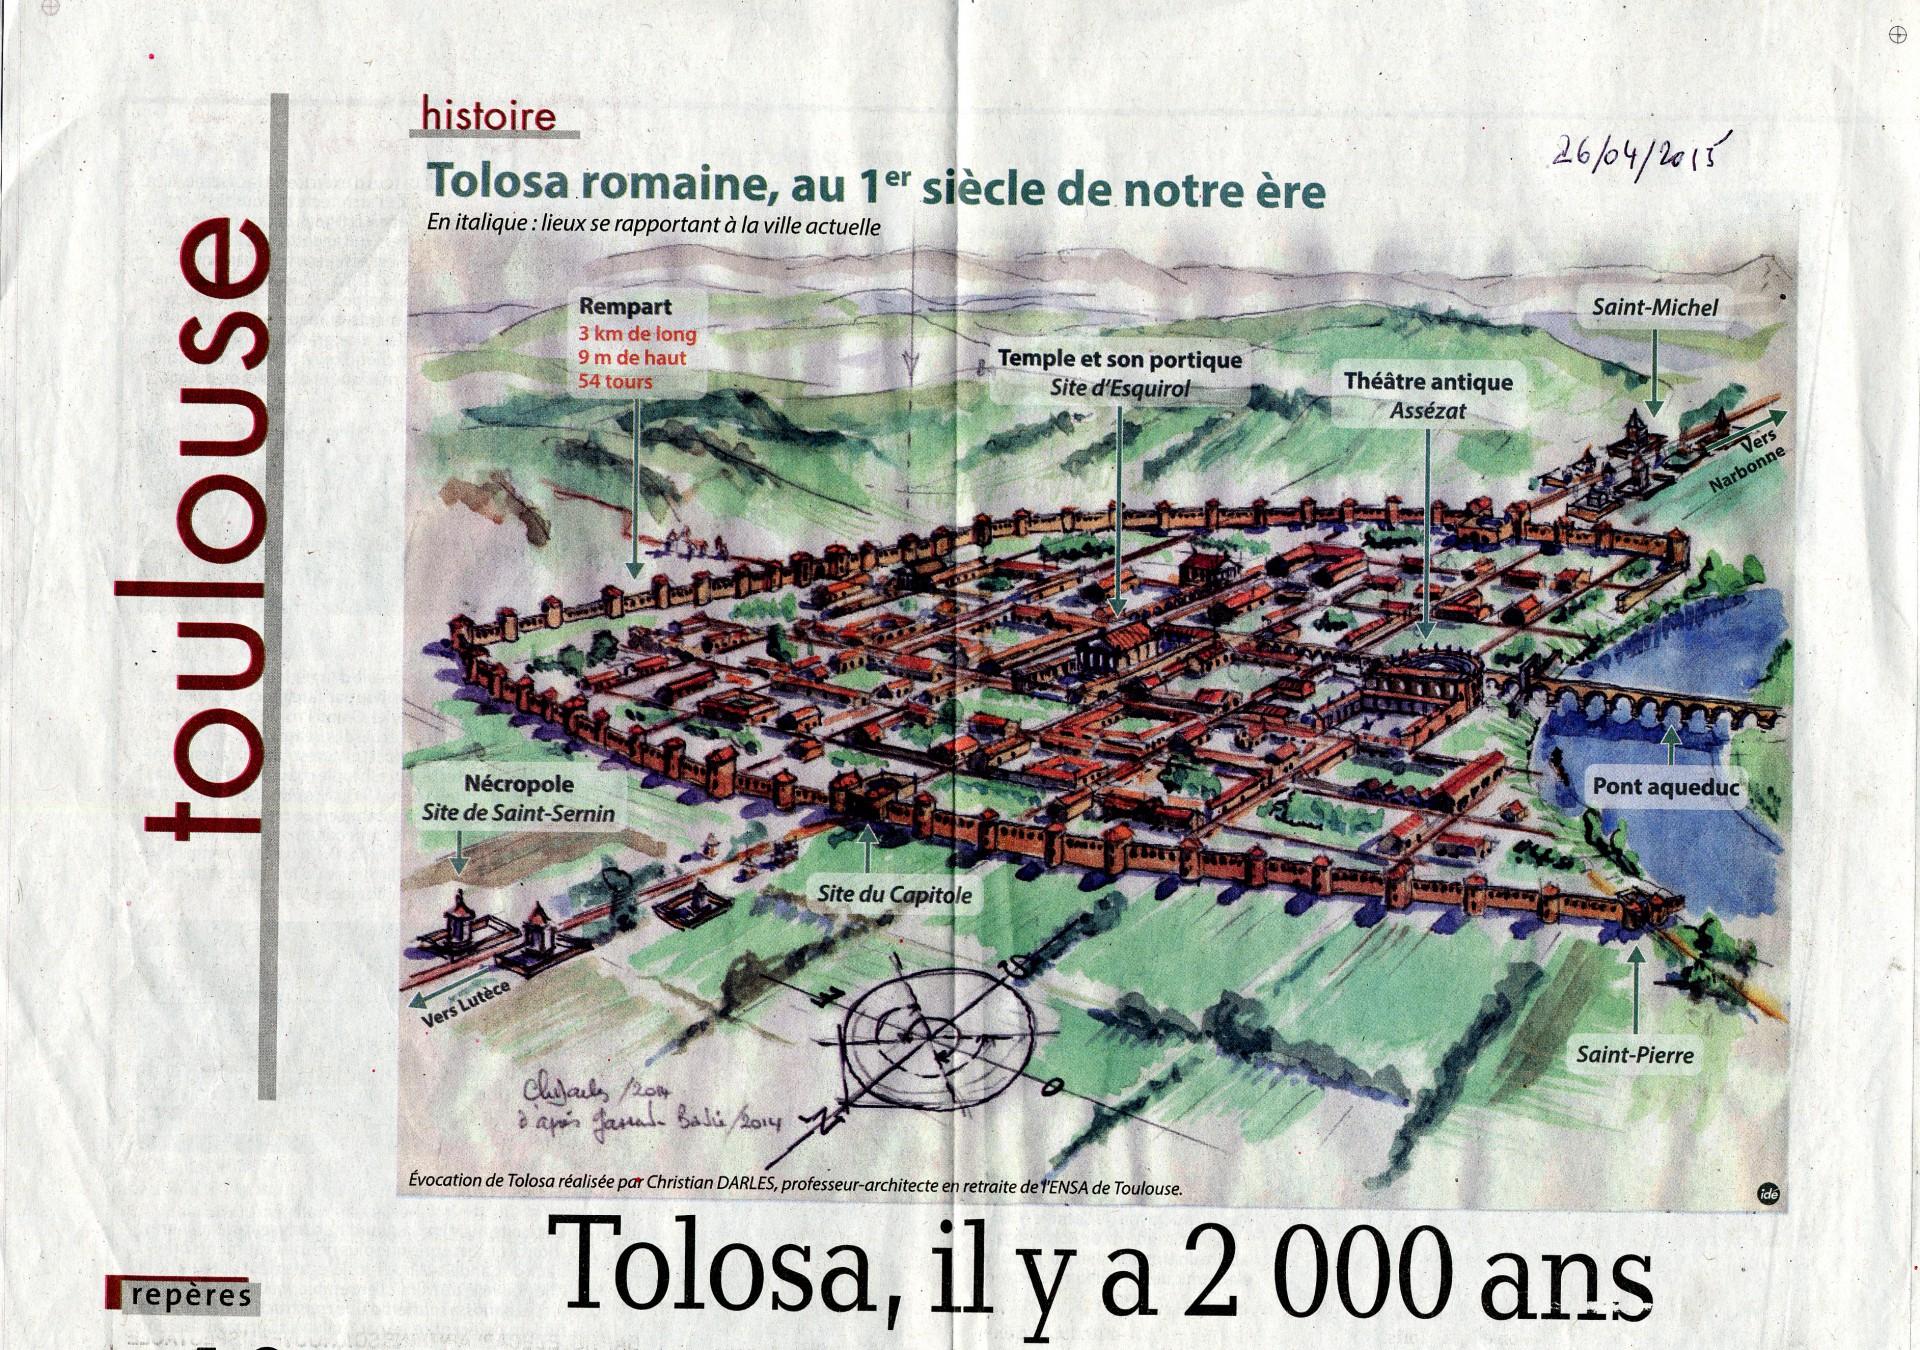 Tolosa, il y a 2000 ans